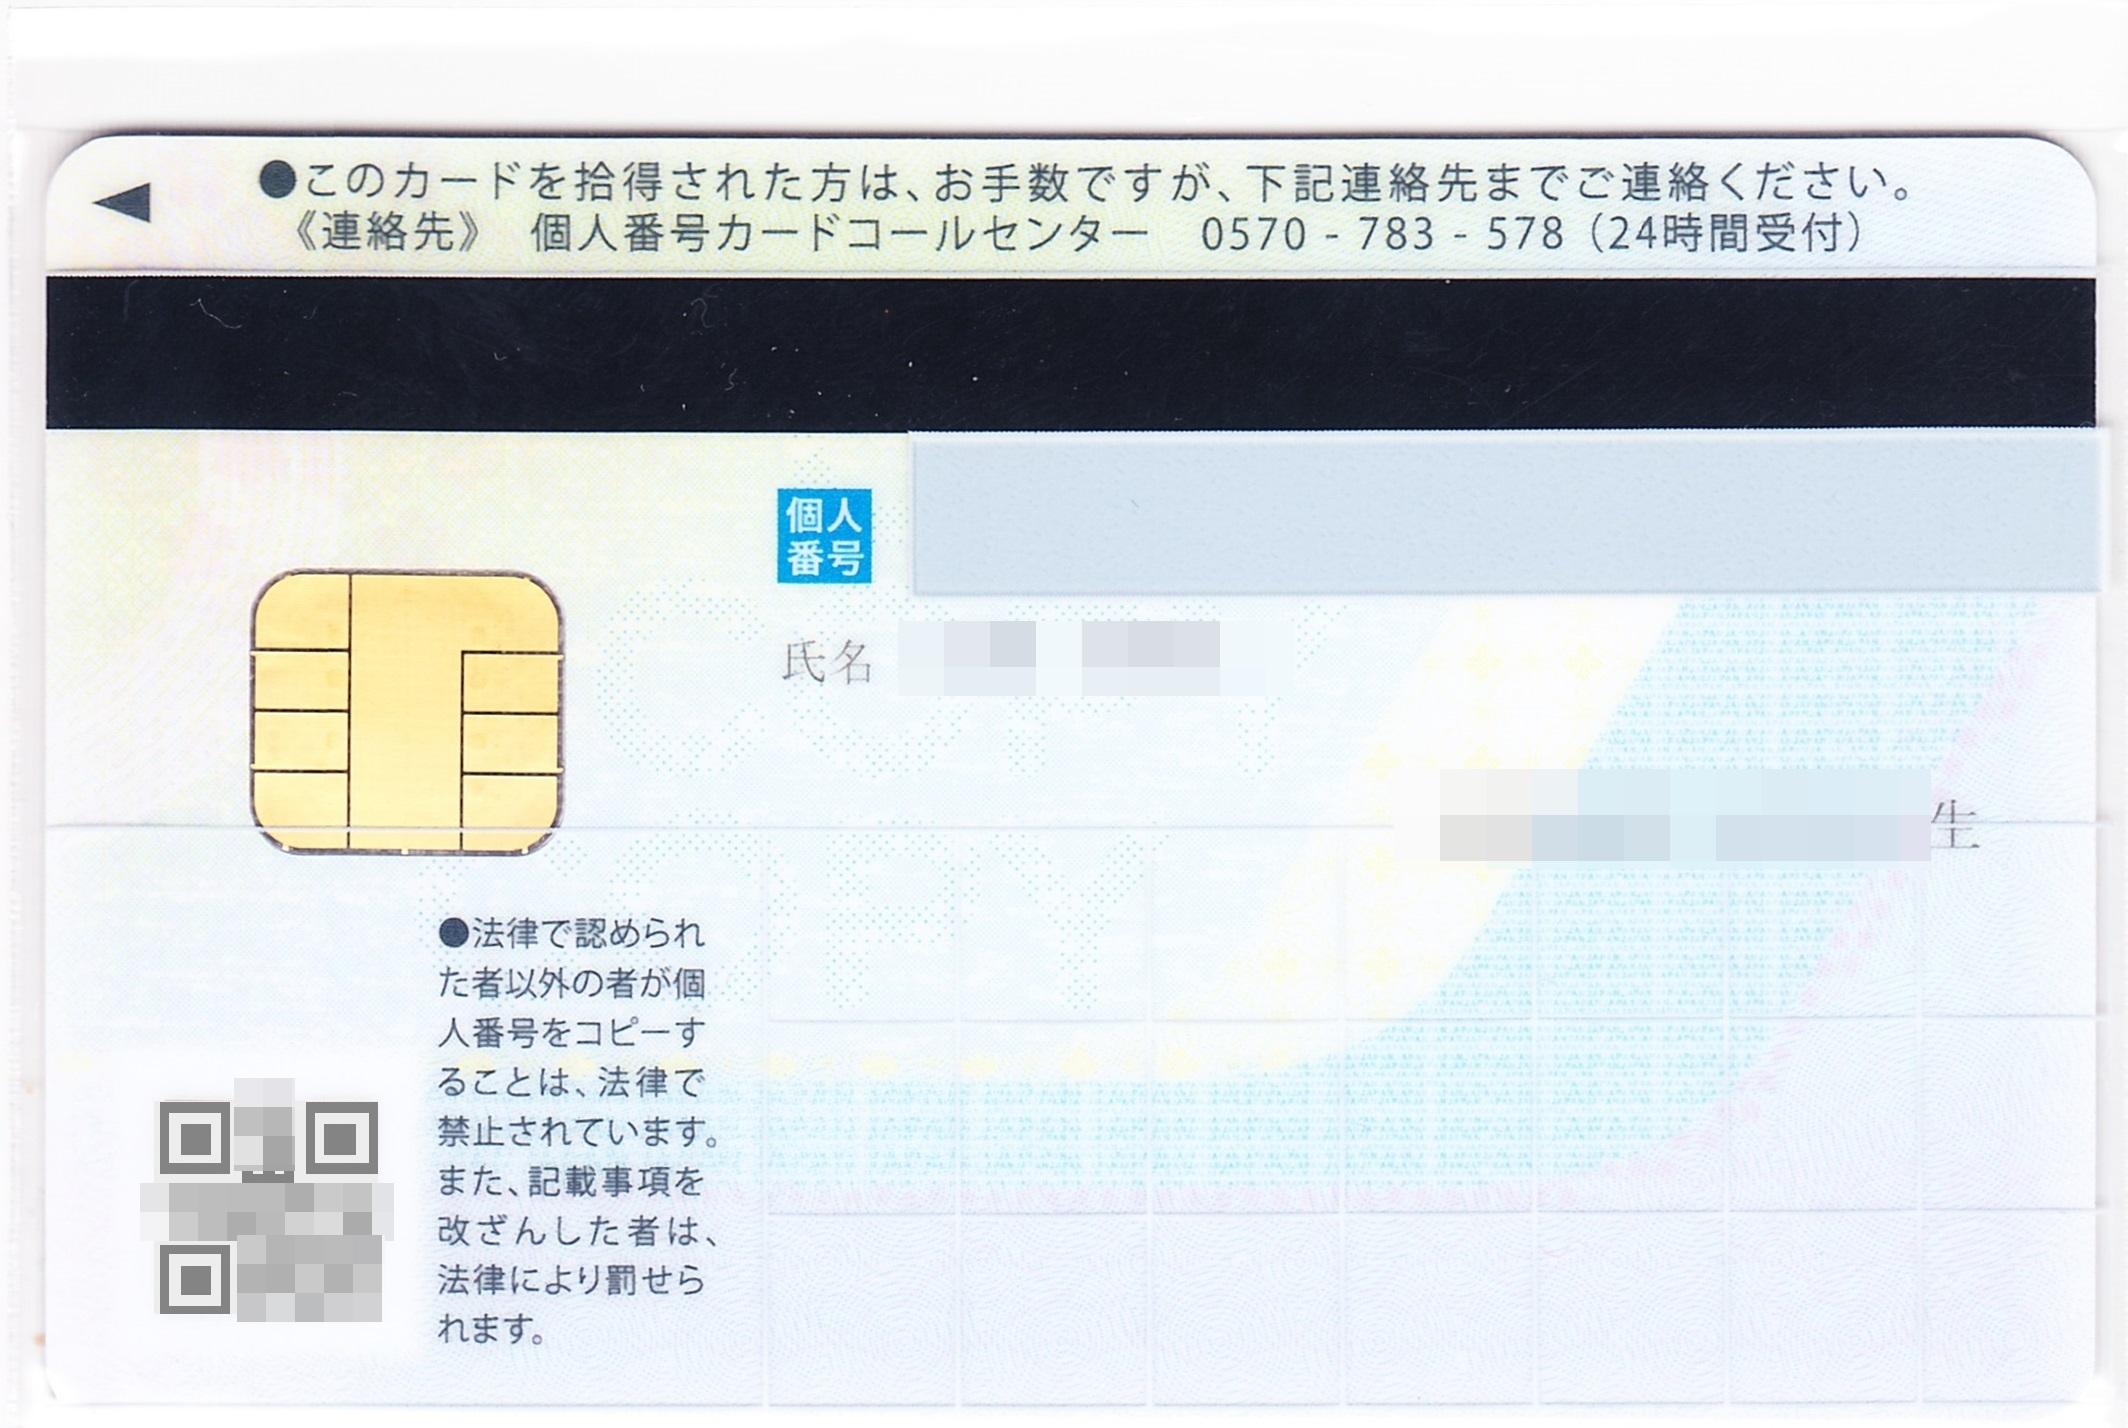 mynumbercard_tailm3.jpg